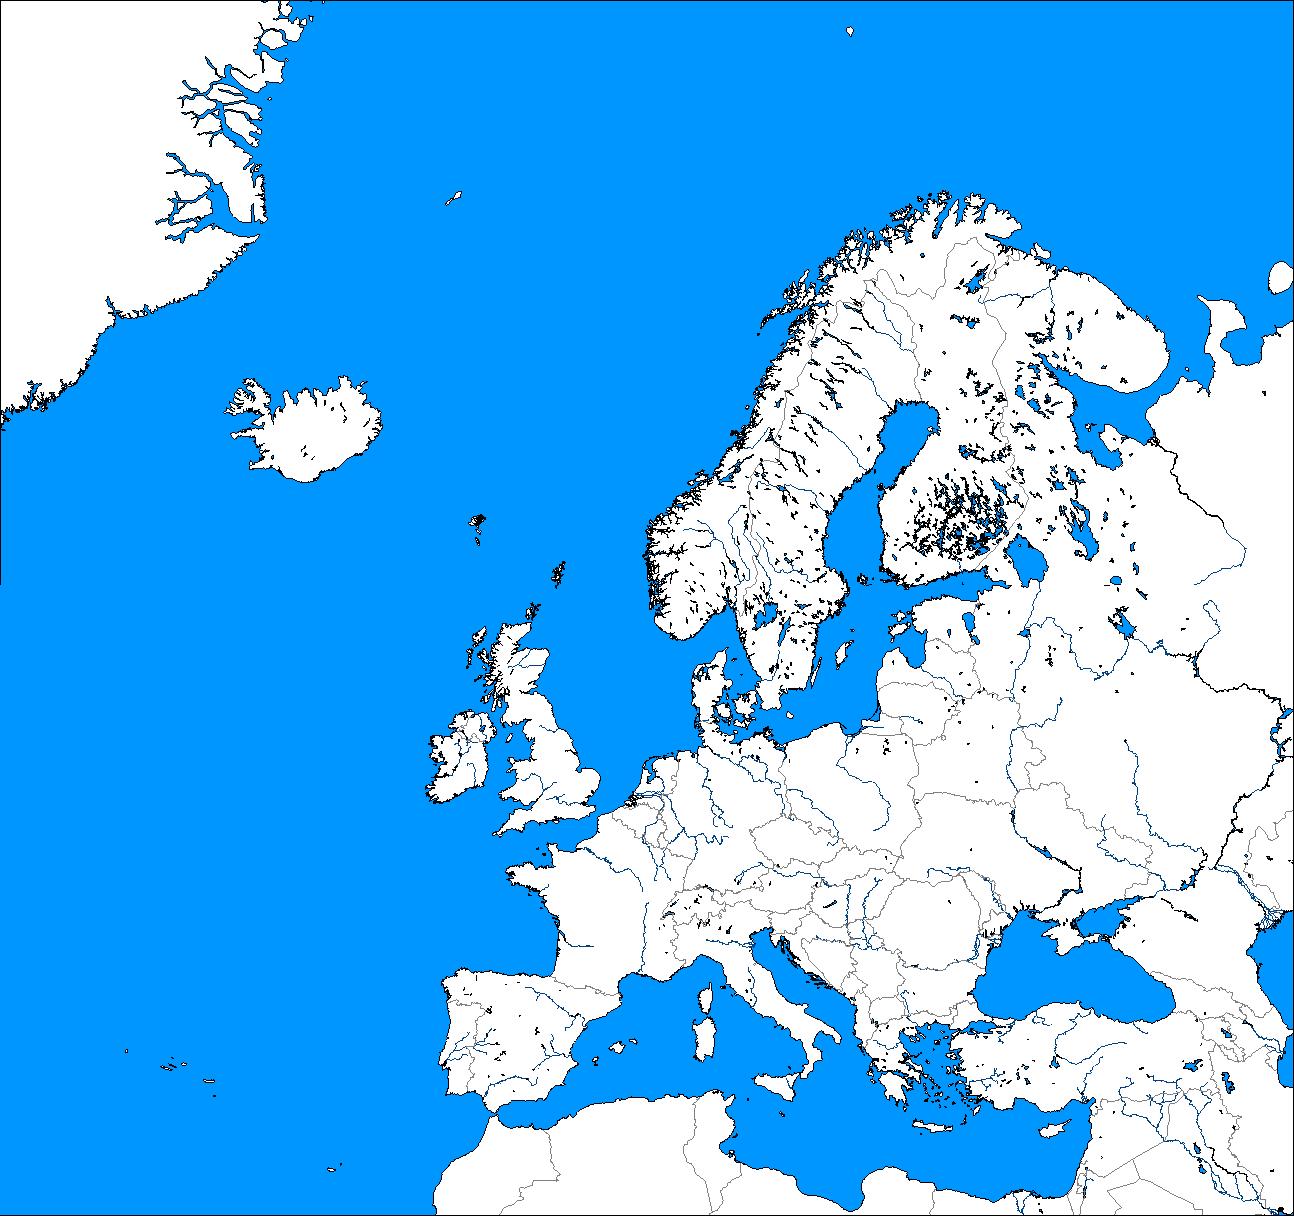 blankmapdirectoryallofeurope alternatehistorycom wiki